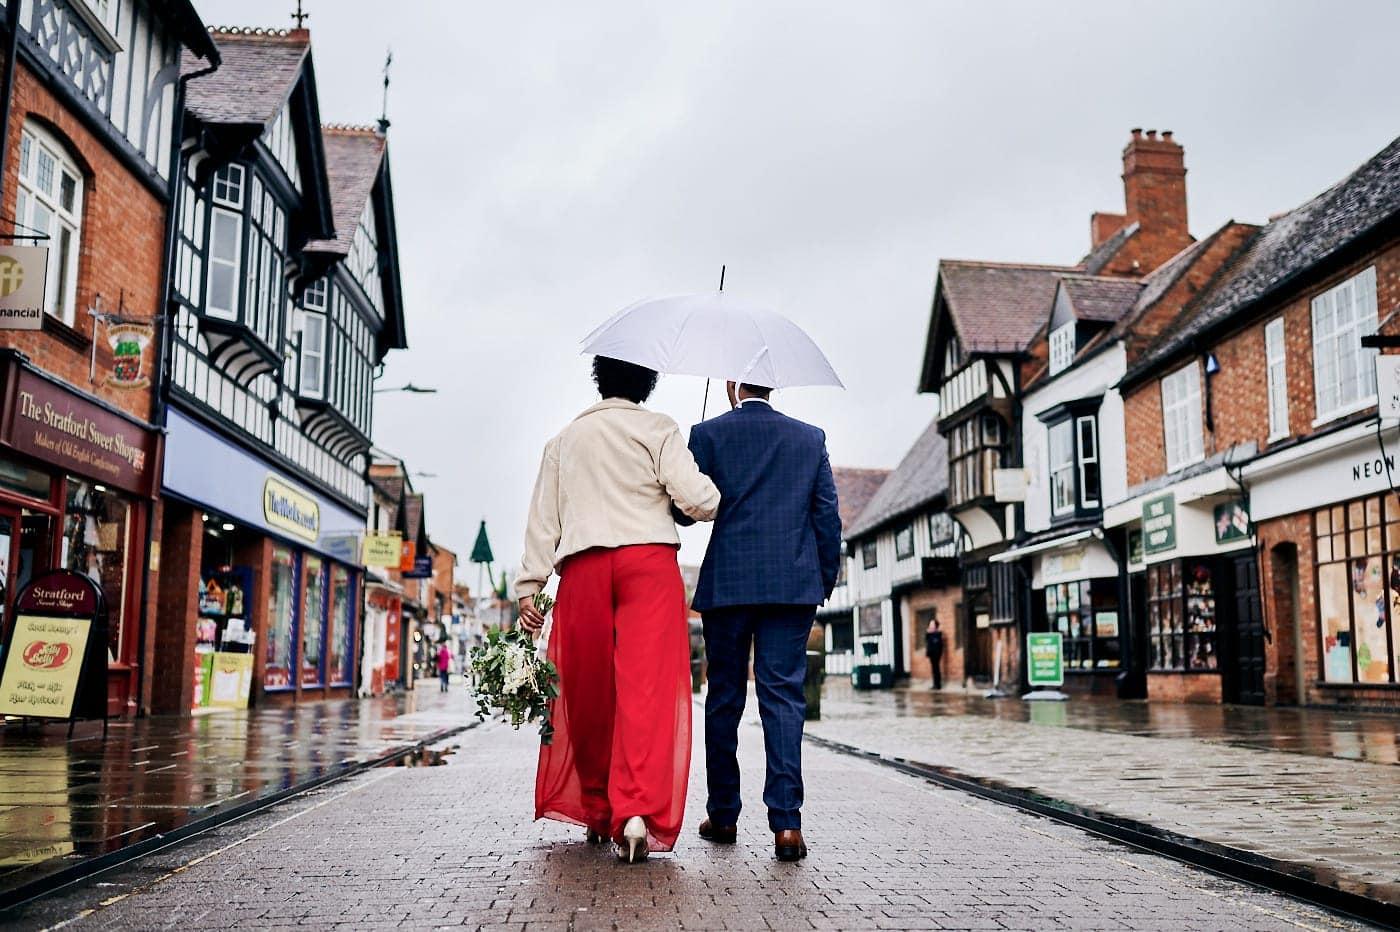 Newly married couple walk arm in arm under umbrella through street in Stratford-upon-Avon